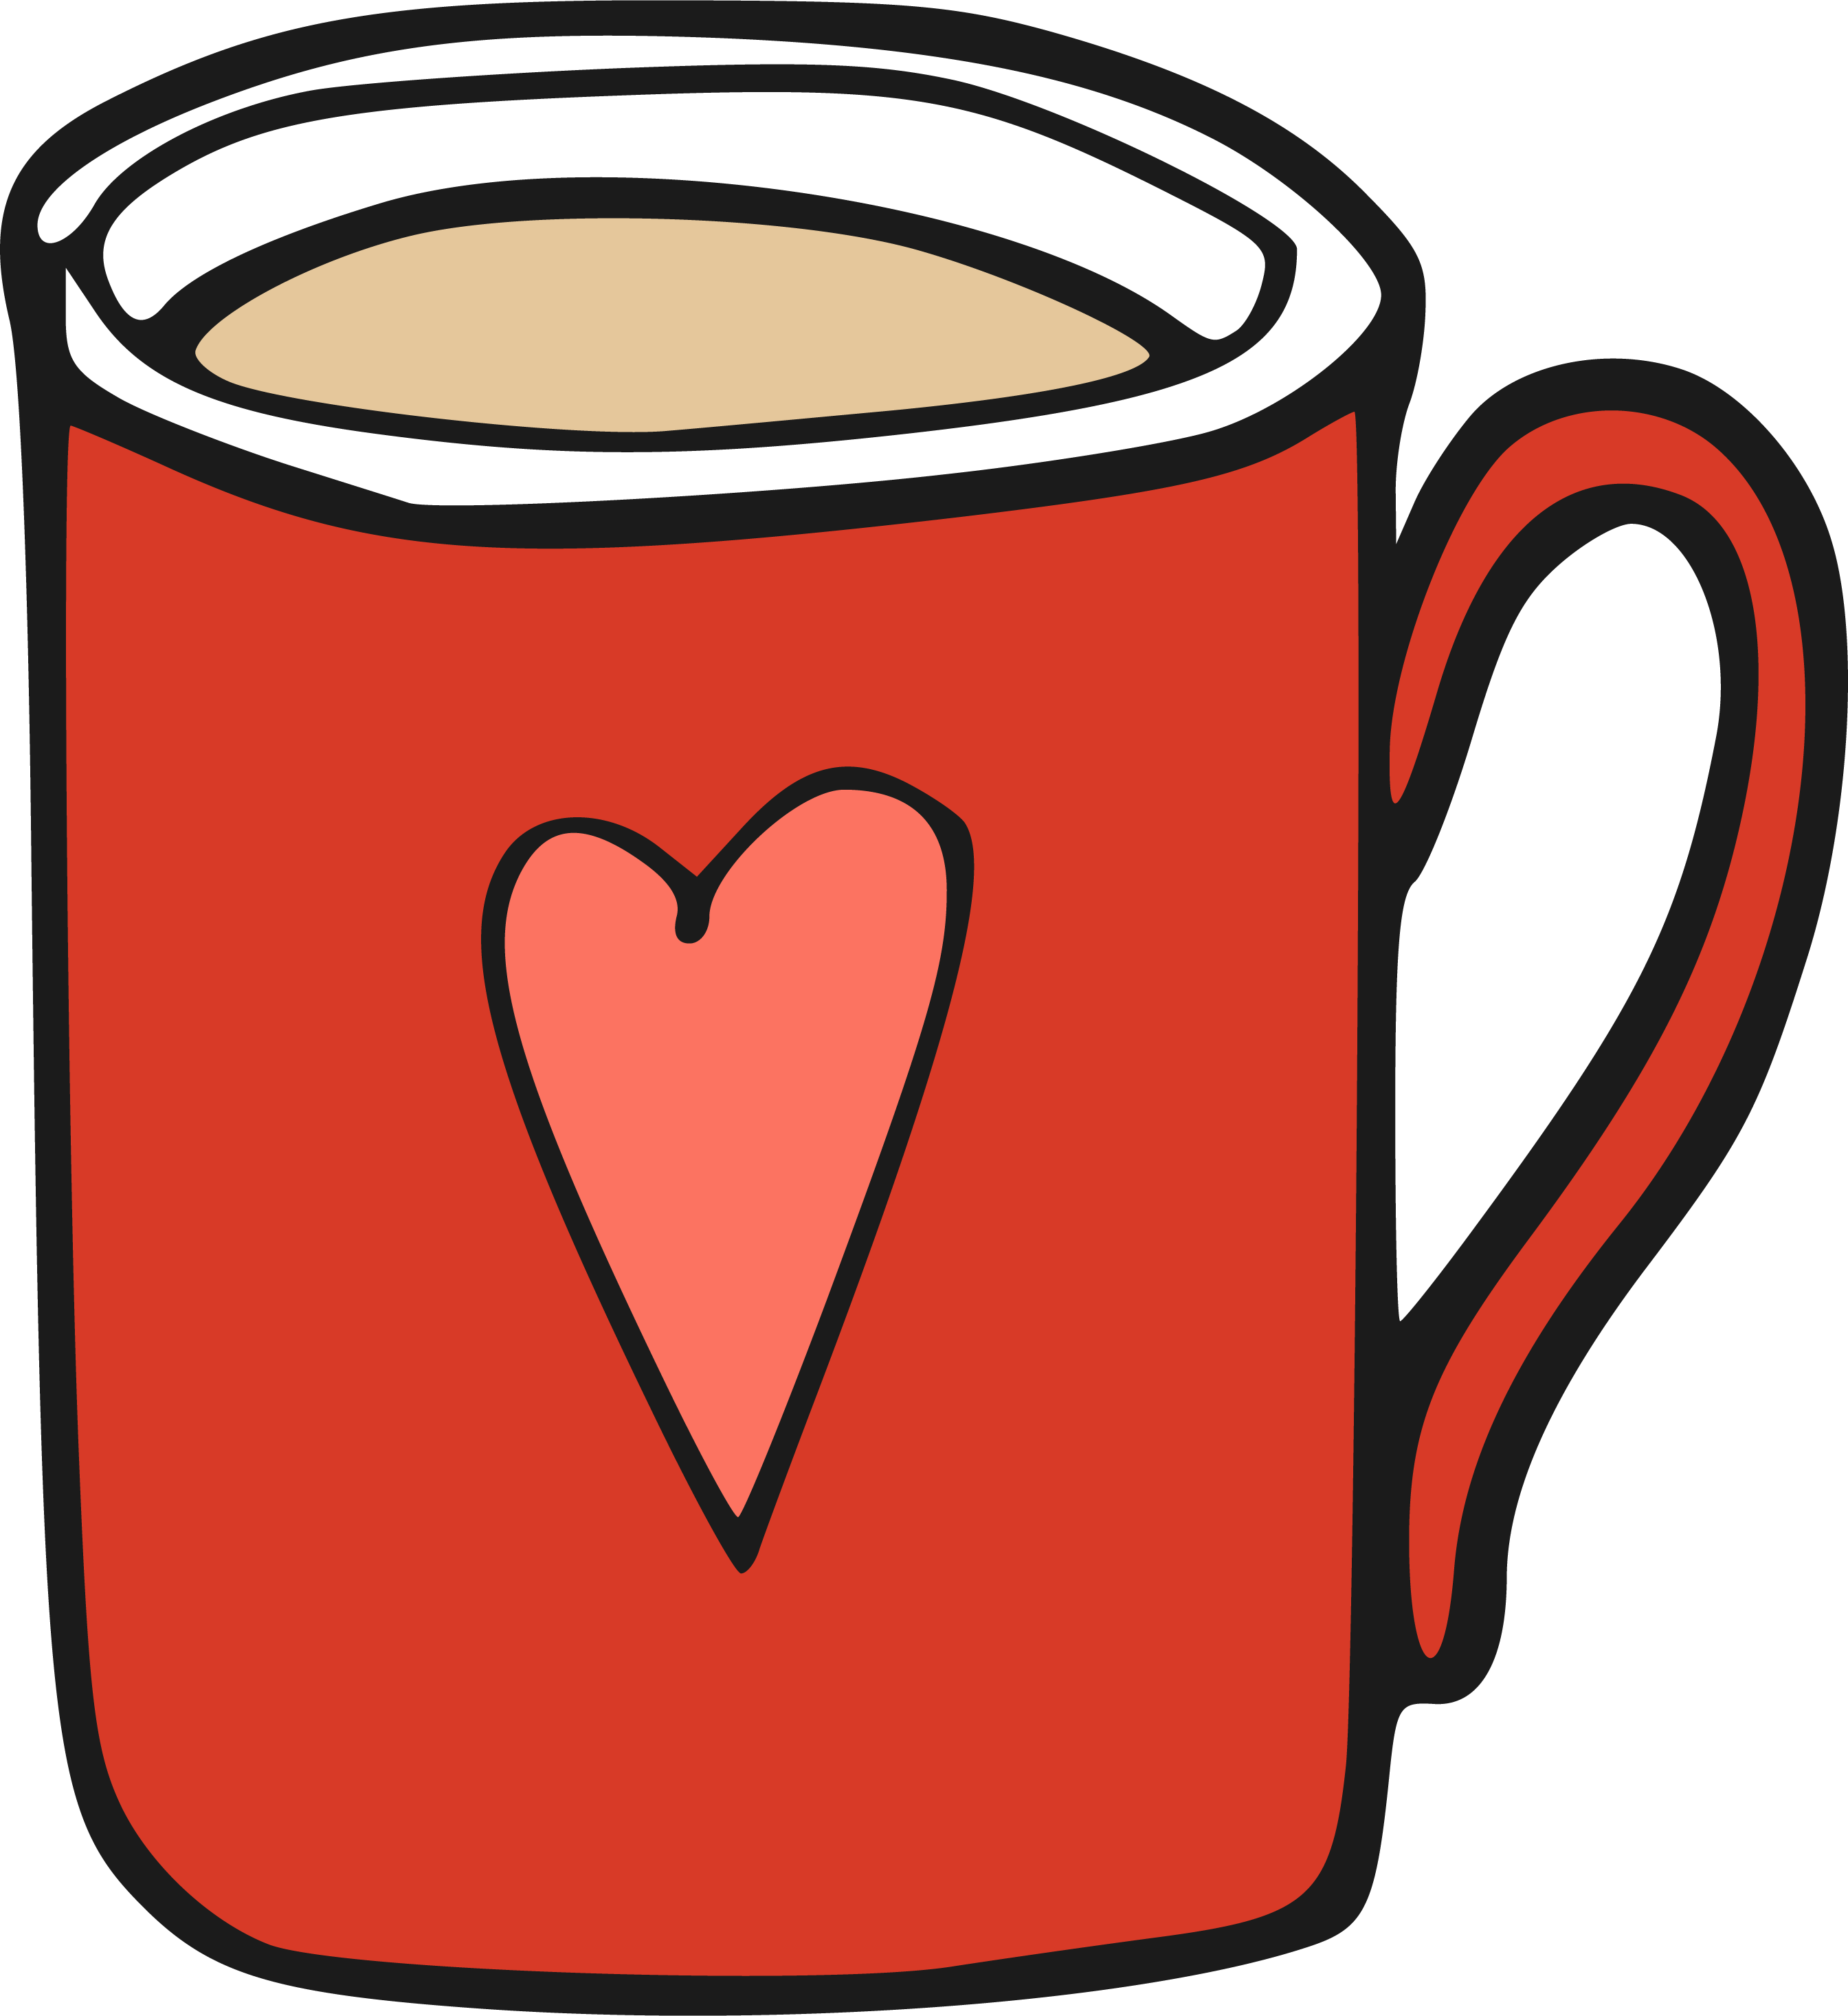 Mug clipart clip art royalty free library Cartoon Coffee Mug Png , Transparent Cartoon - Jing.fm clip art royalty free library